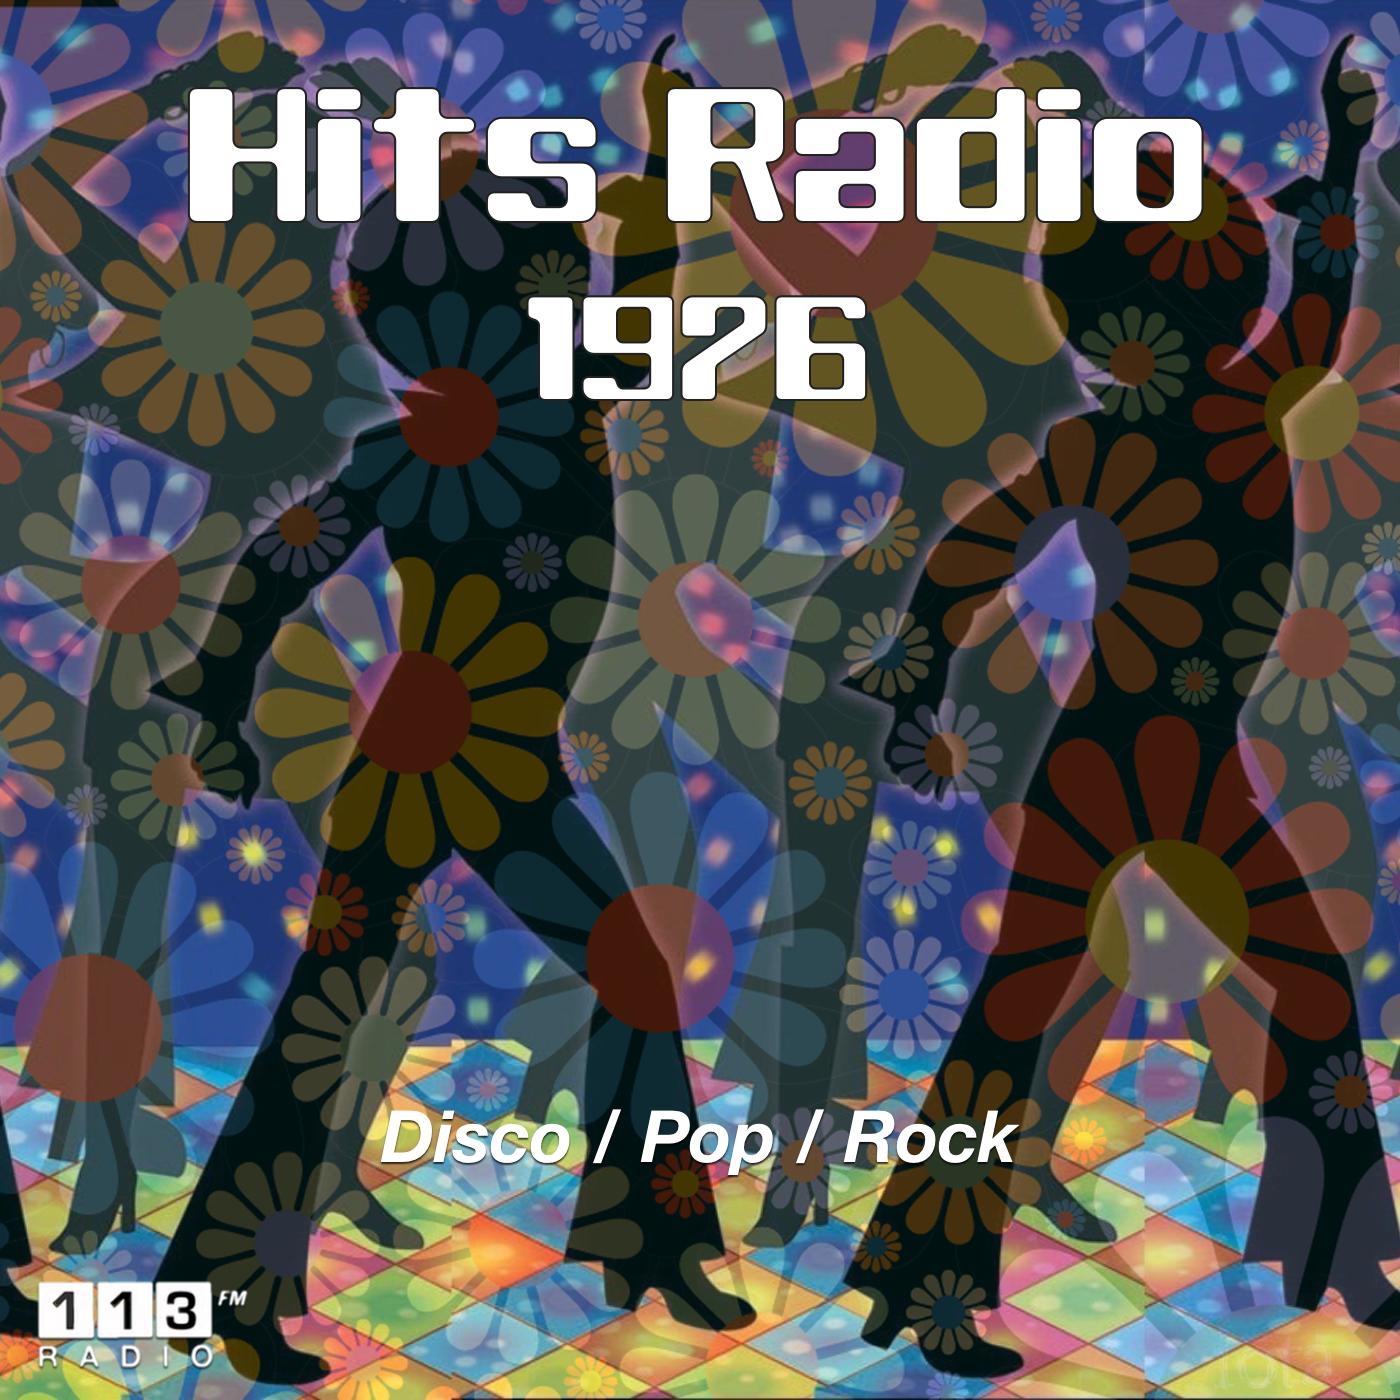 113.fm Hits Radio - 1976